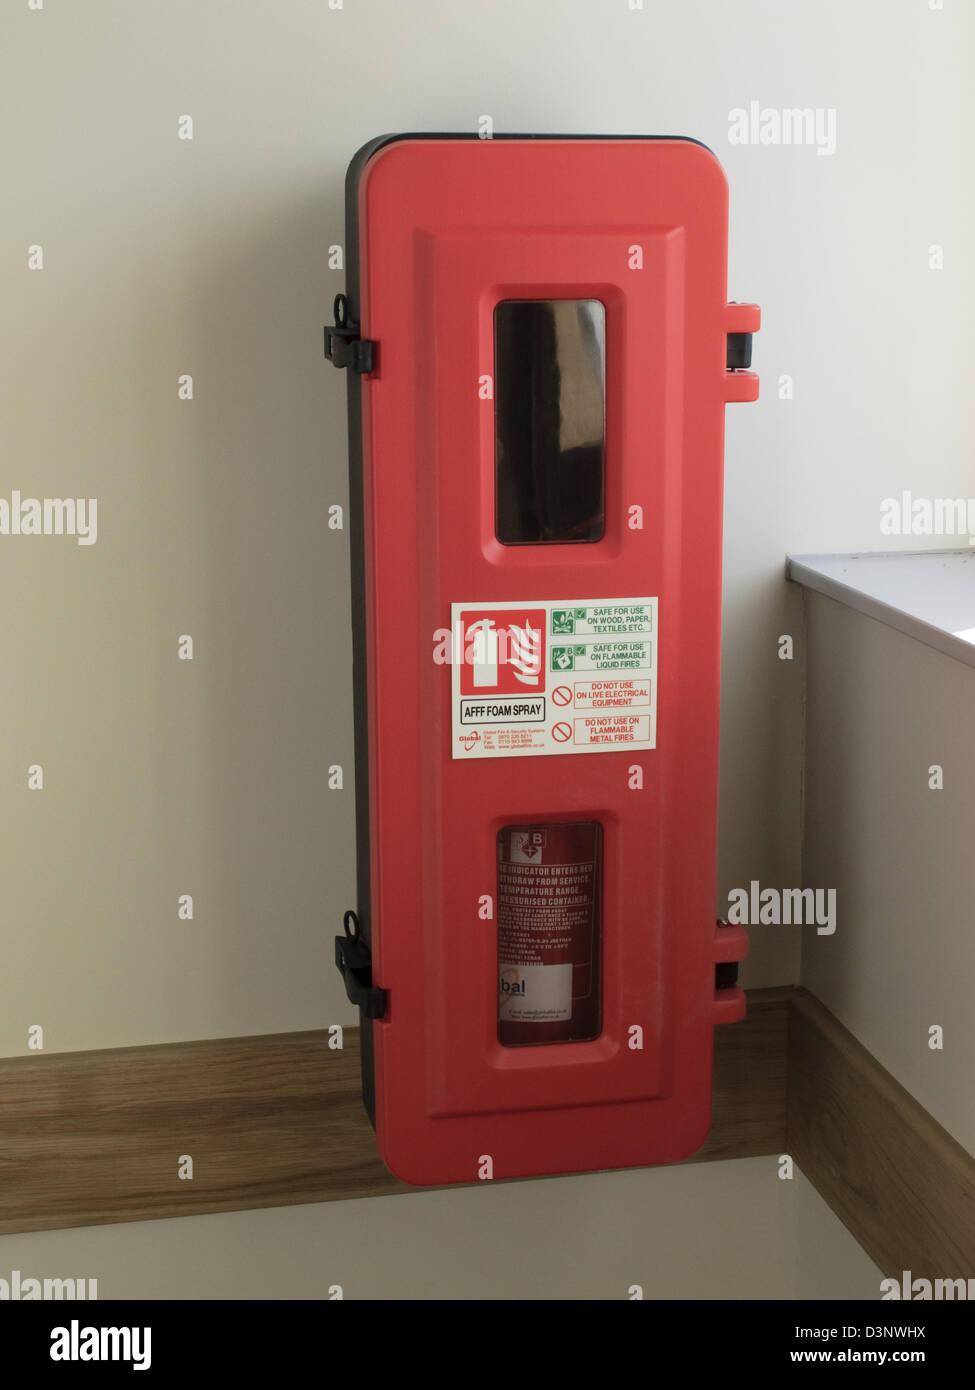 fire extinguisher hotel internal - Stock Image